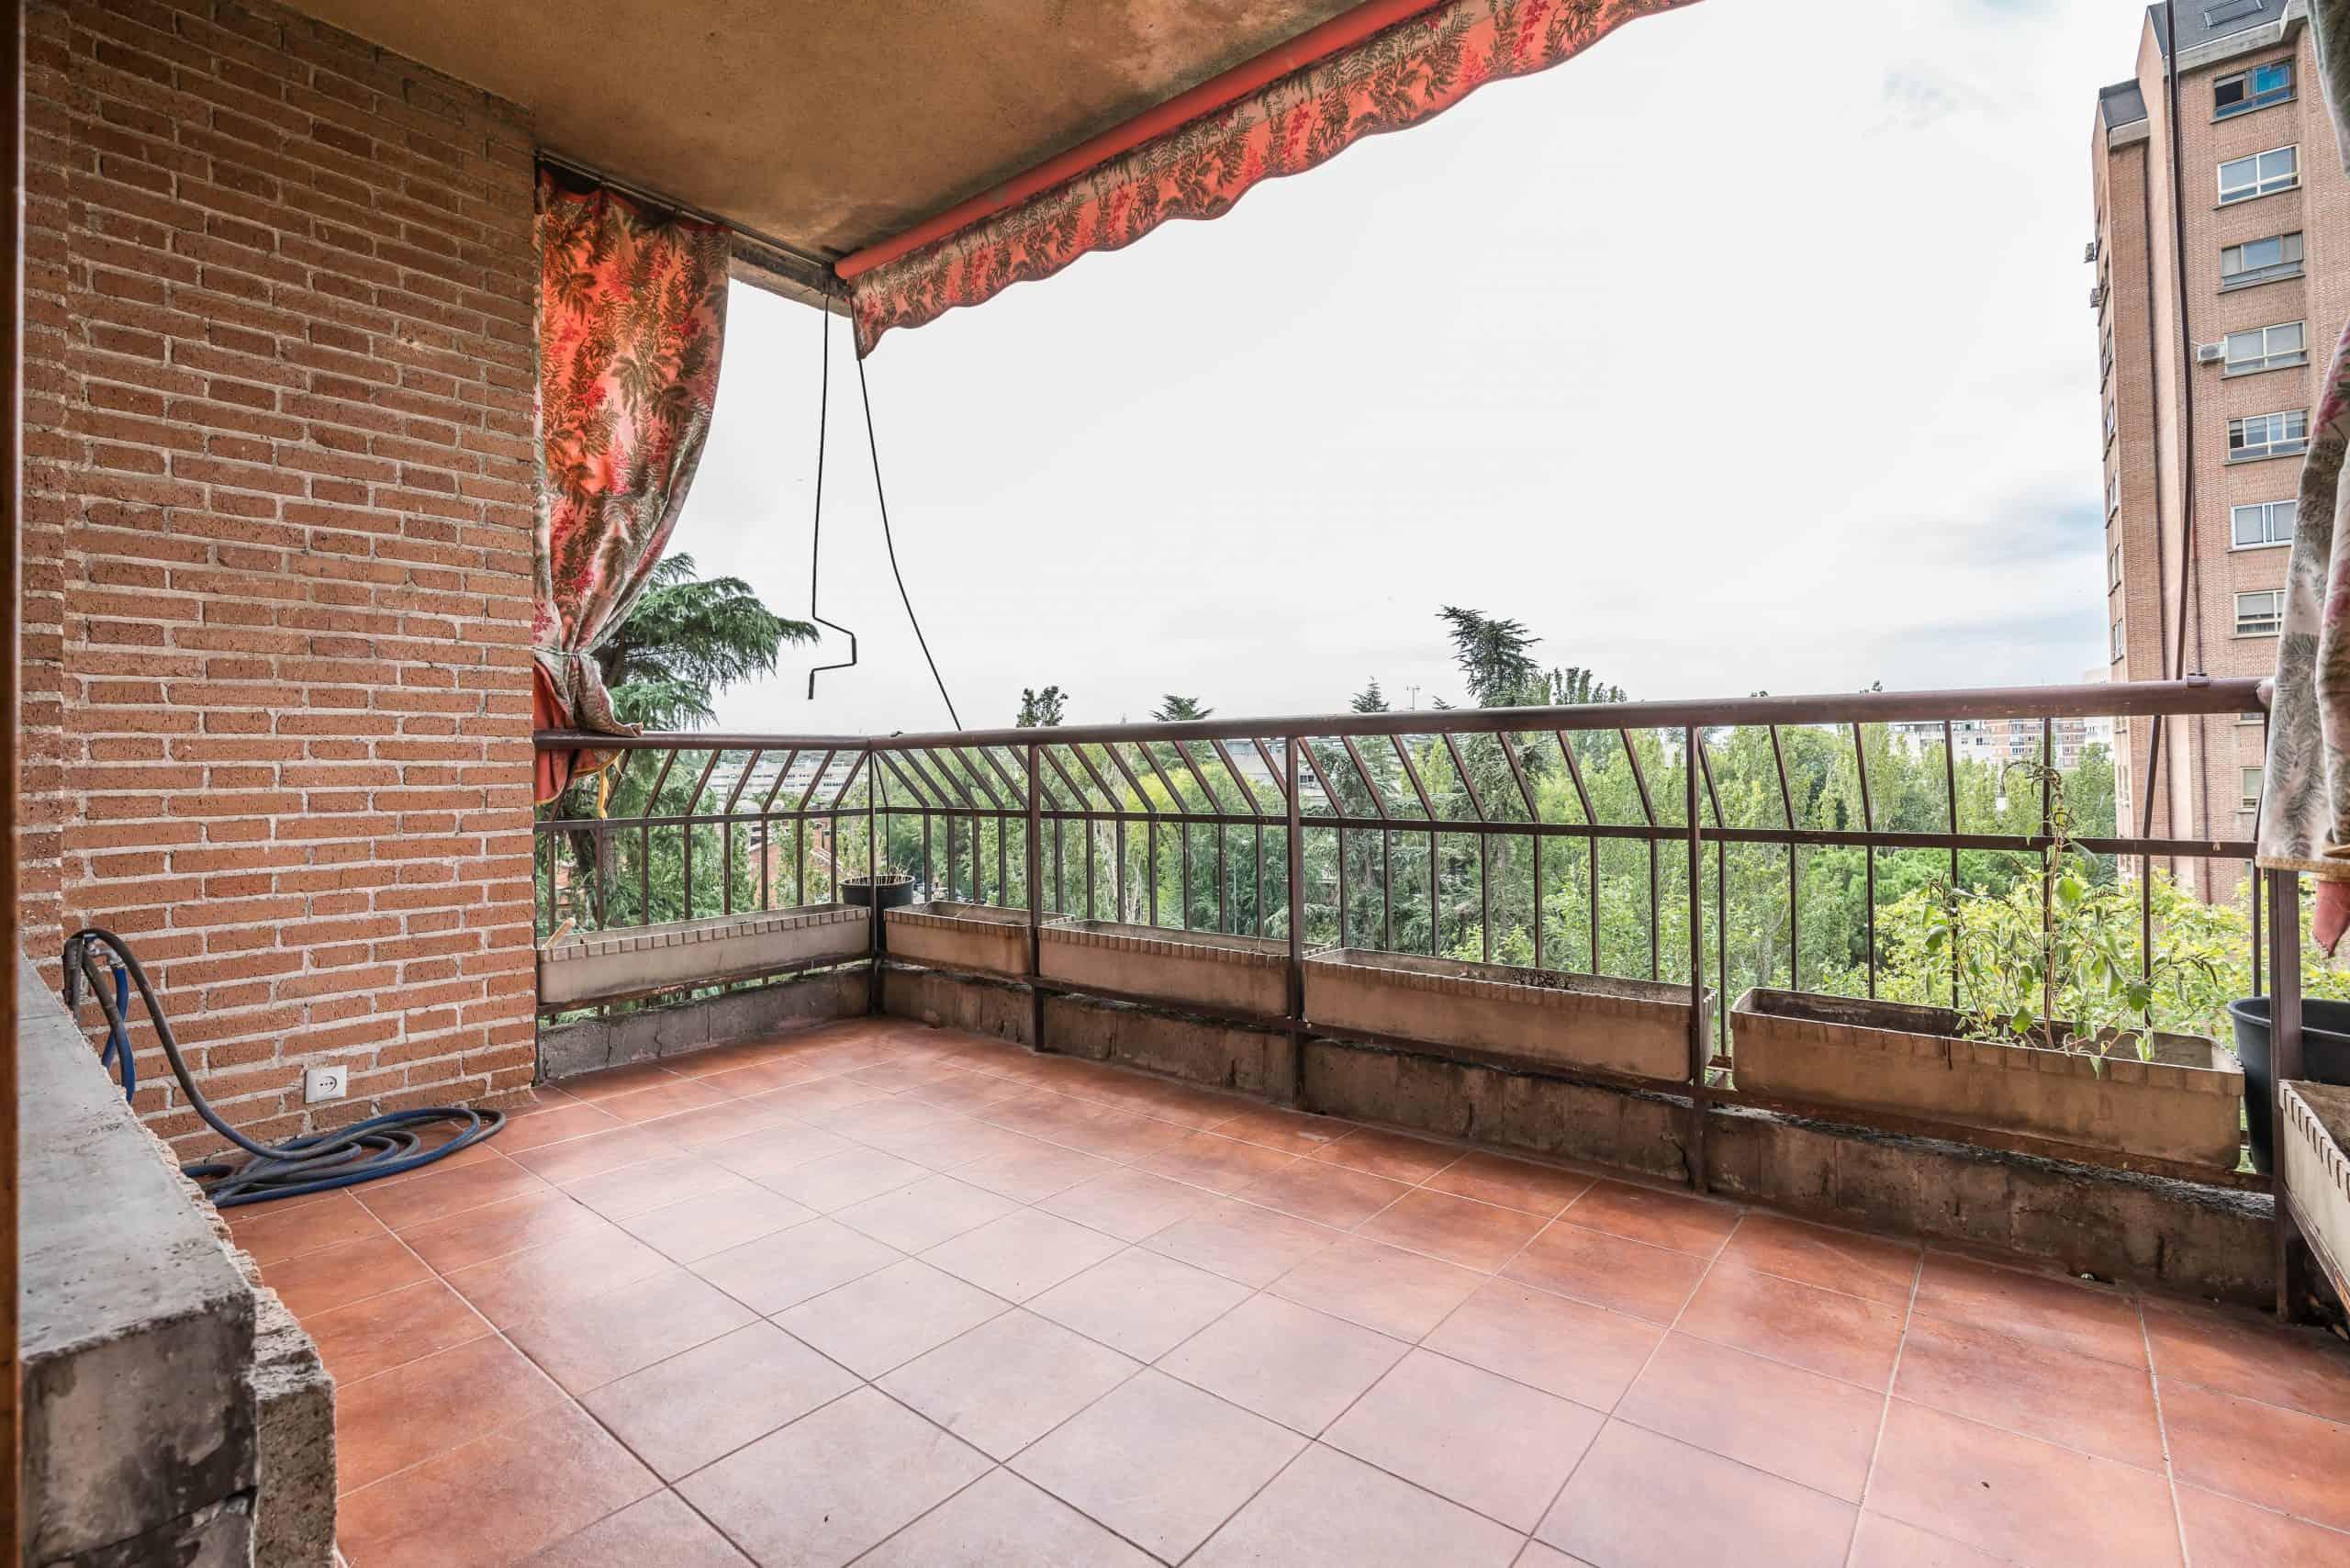 Agencia Inmobiliaria de Madrid-FUTUROCASA-Zona ARGANZUELA-EMBAJADORES-LEGAZPI -calle Embajadores- baño 10